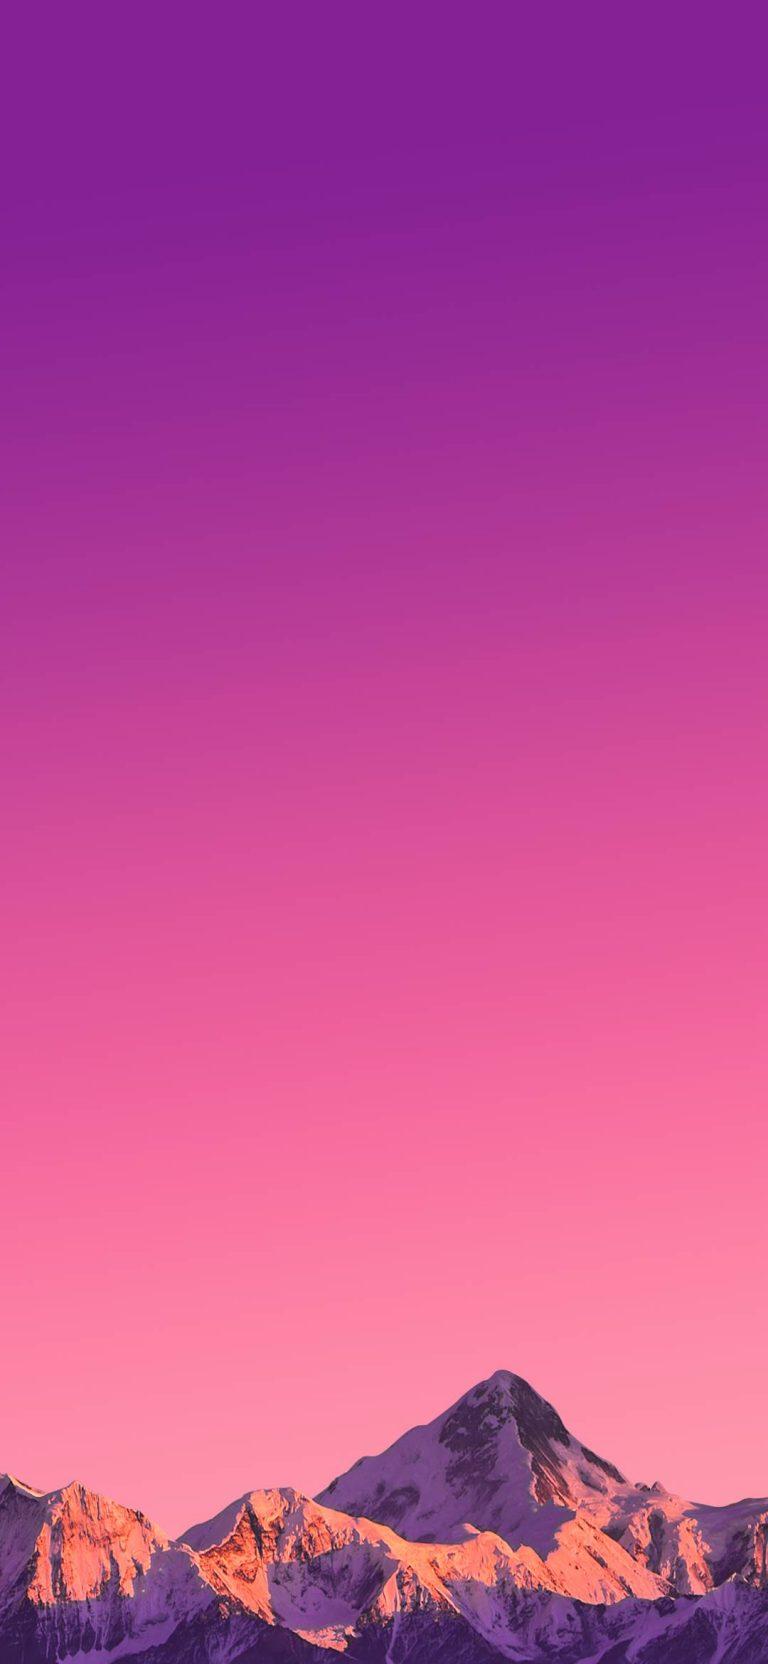 Vivo NEX Dual Display Edition Stock Wallpaper 03 1080x2340 768x1664